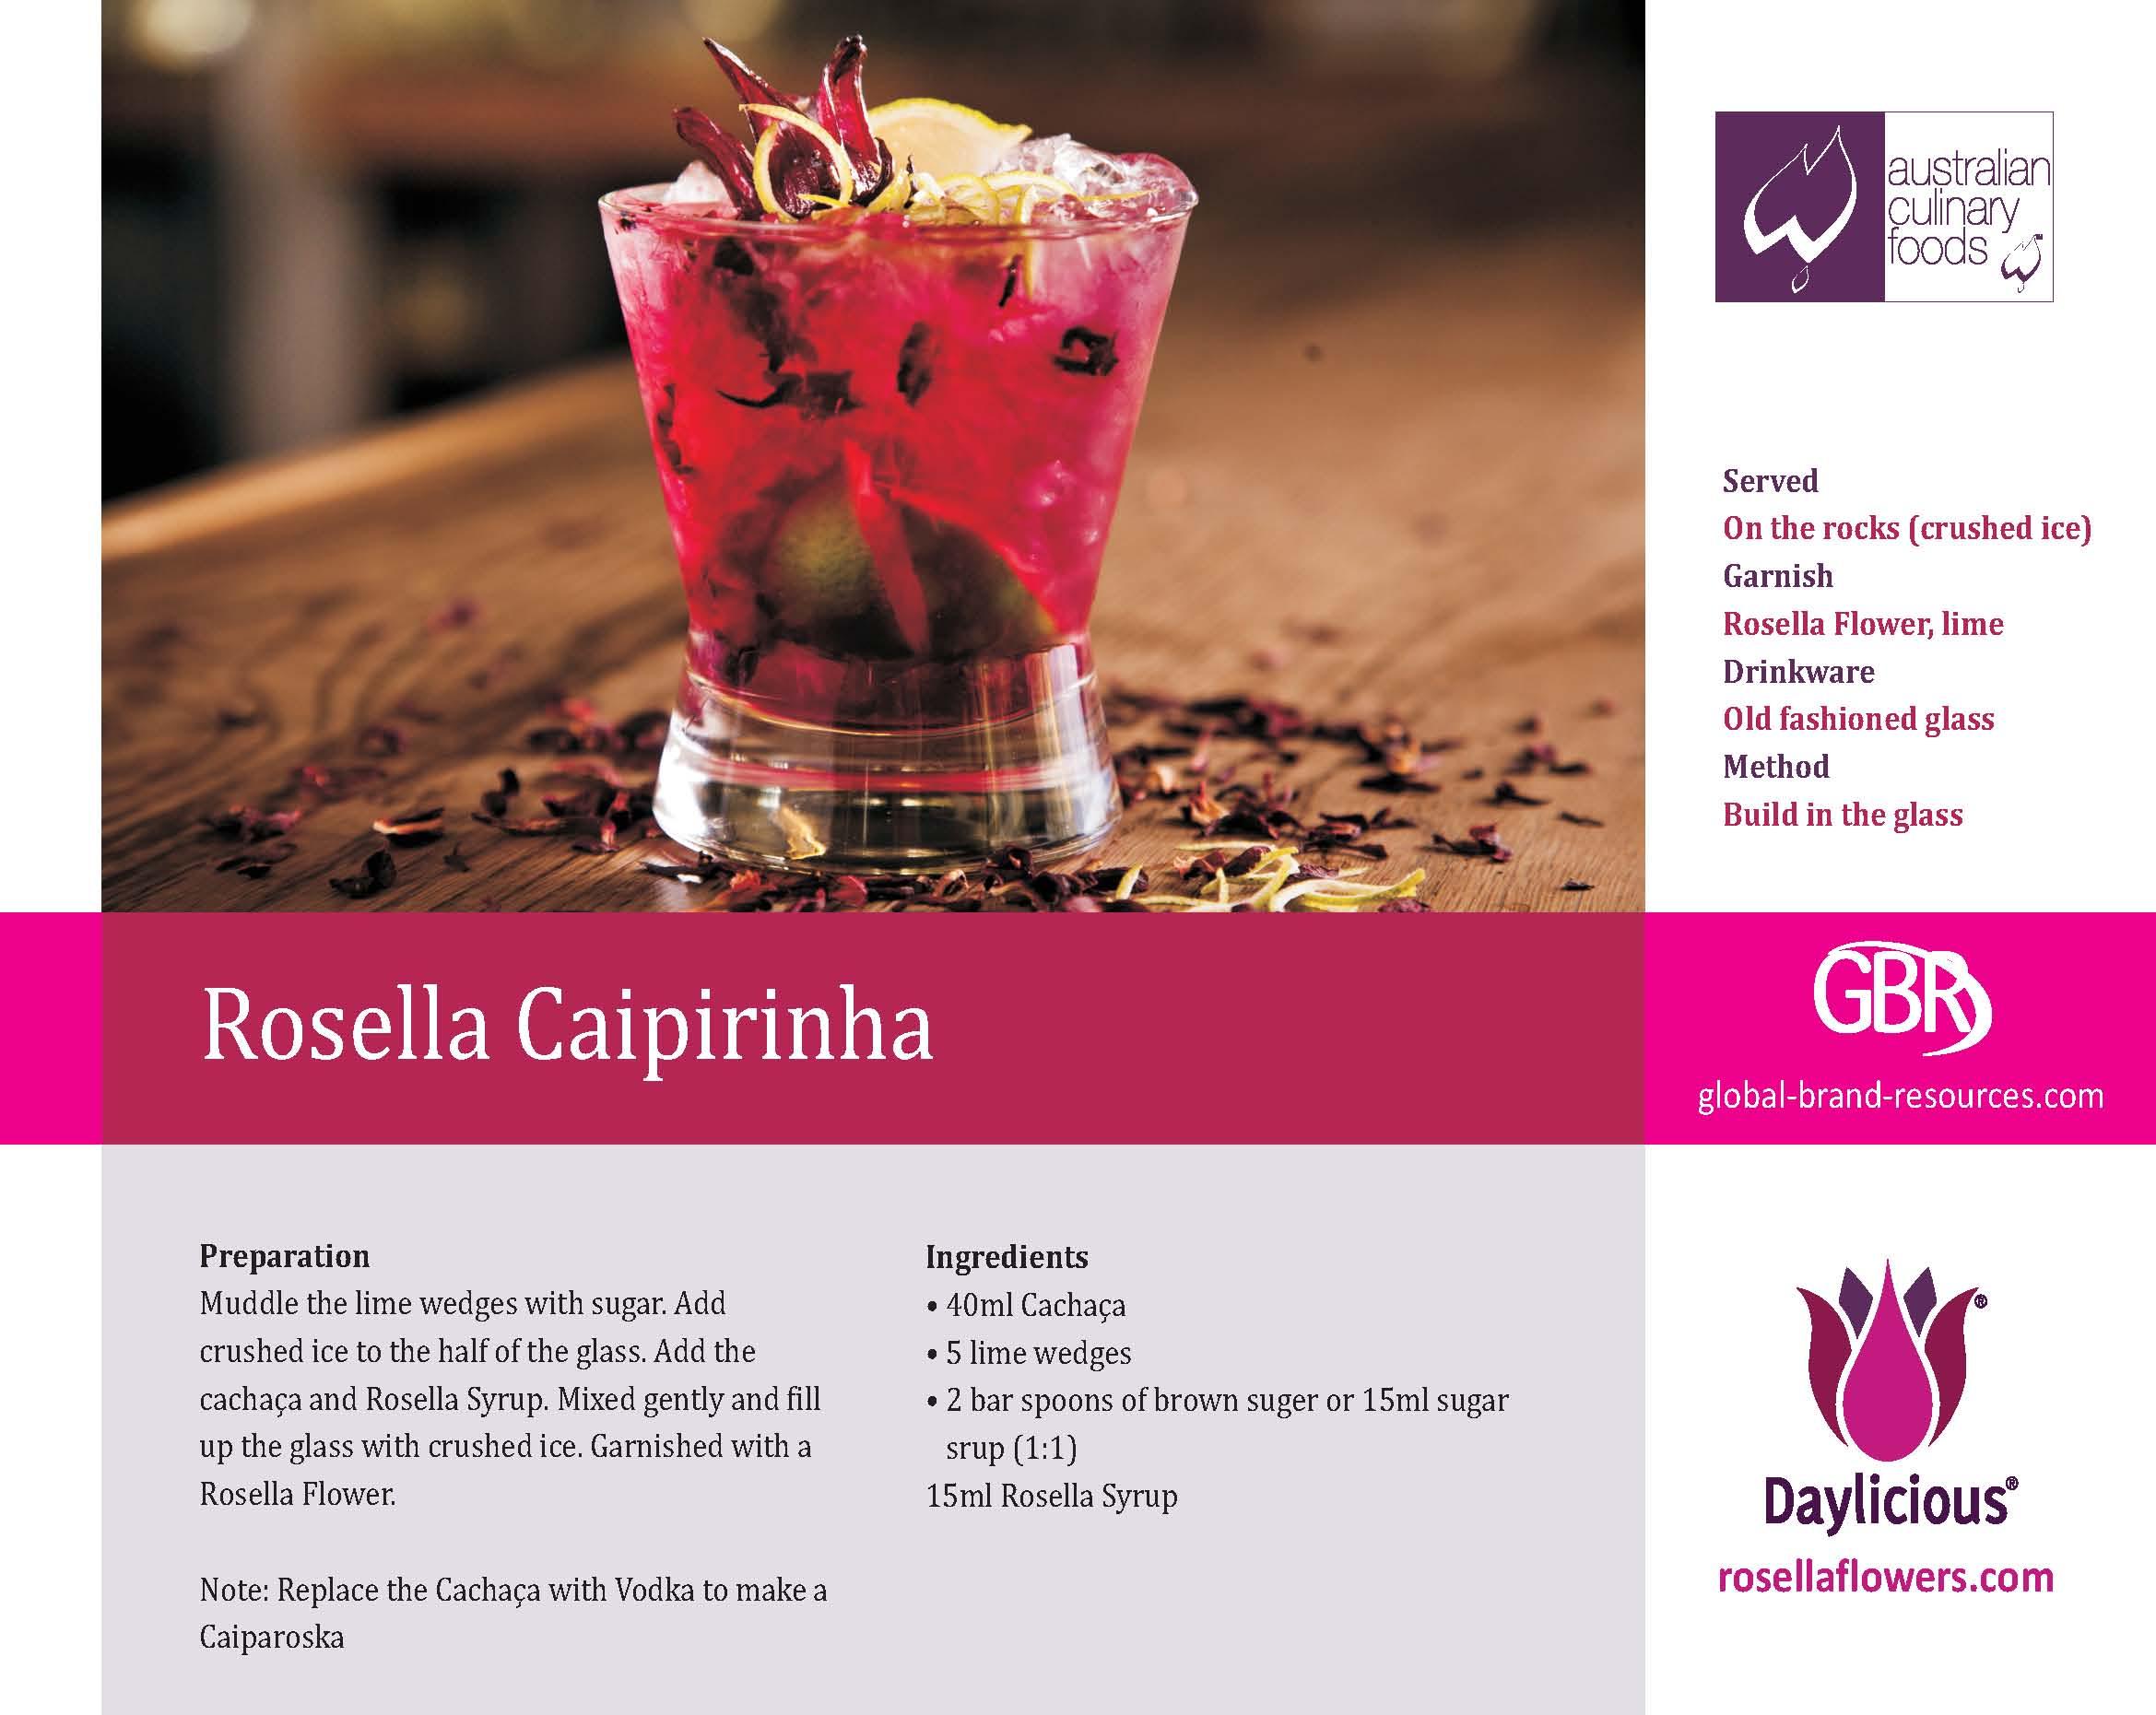 Rosella Caipirinha